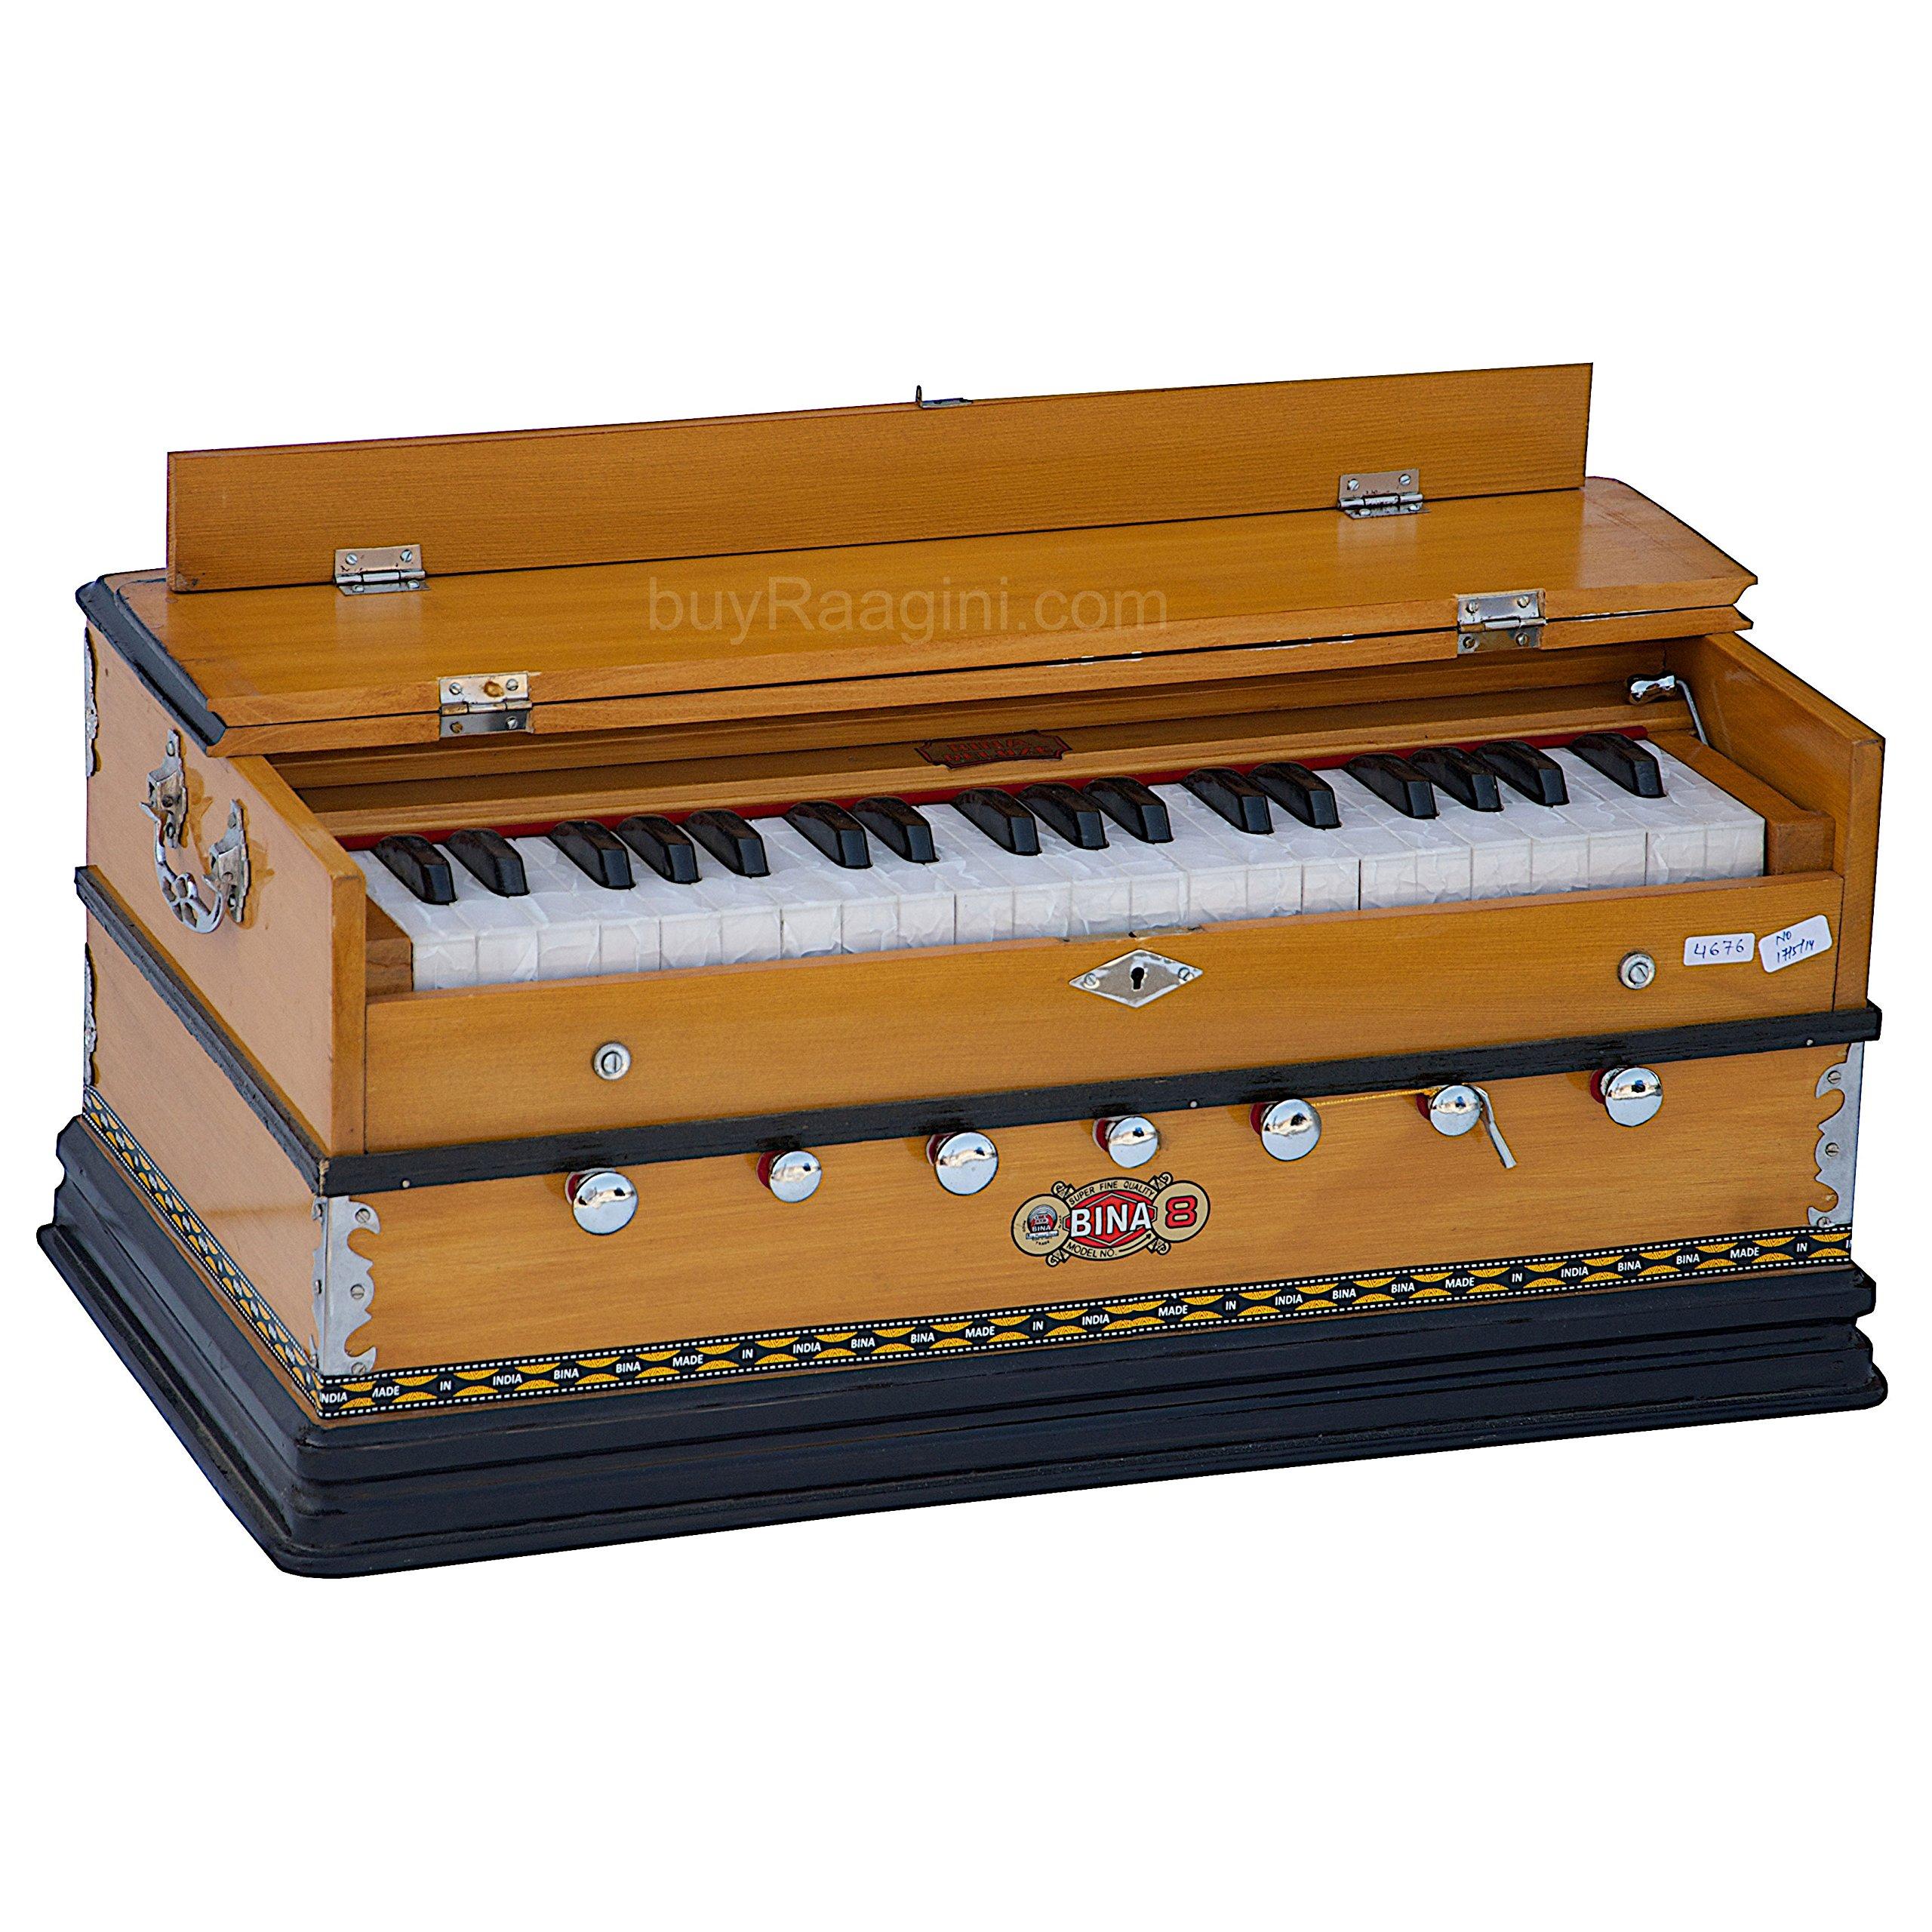 Harmonium Musical Instrument, BINA No. 8, 7 Stops, 3 1/4 Octaves, Coupler, Tuned To A400, Double Reed, Natural Color, Book, Nylon Bag (PDI-DJF) by Bina (Image #7)